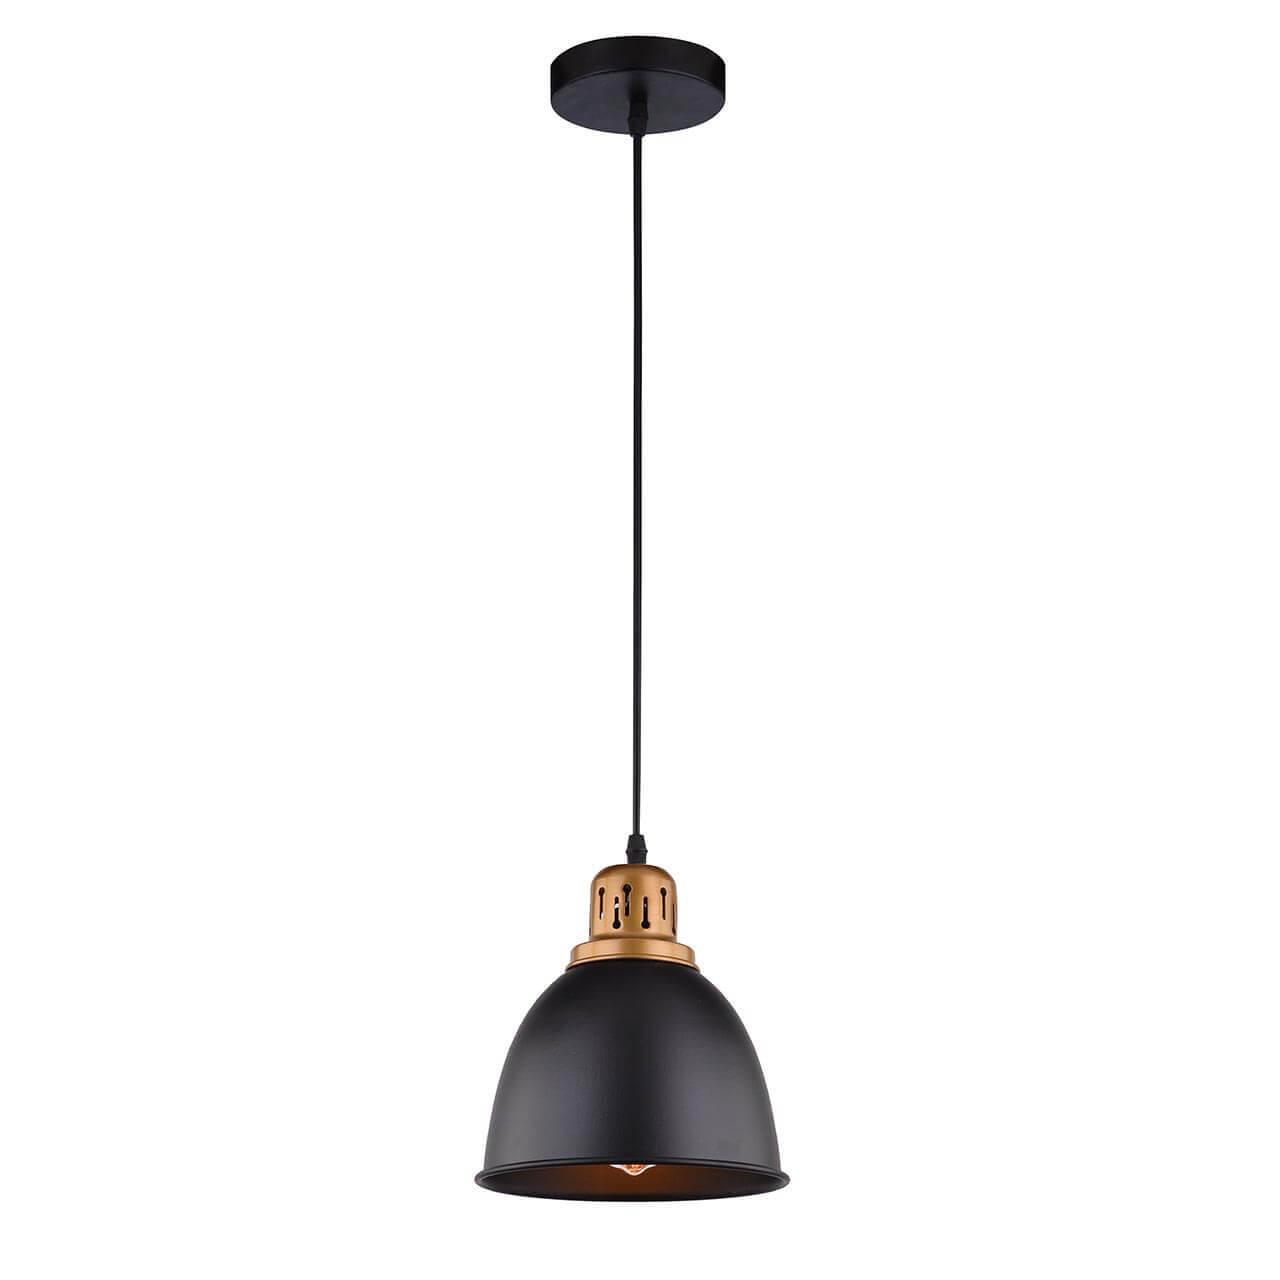 Светильник Arte Lamp A4245SP-1BK Eurica светильник arte lamp a4248sp 1bk eurica